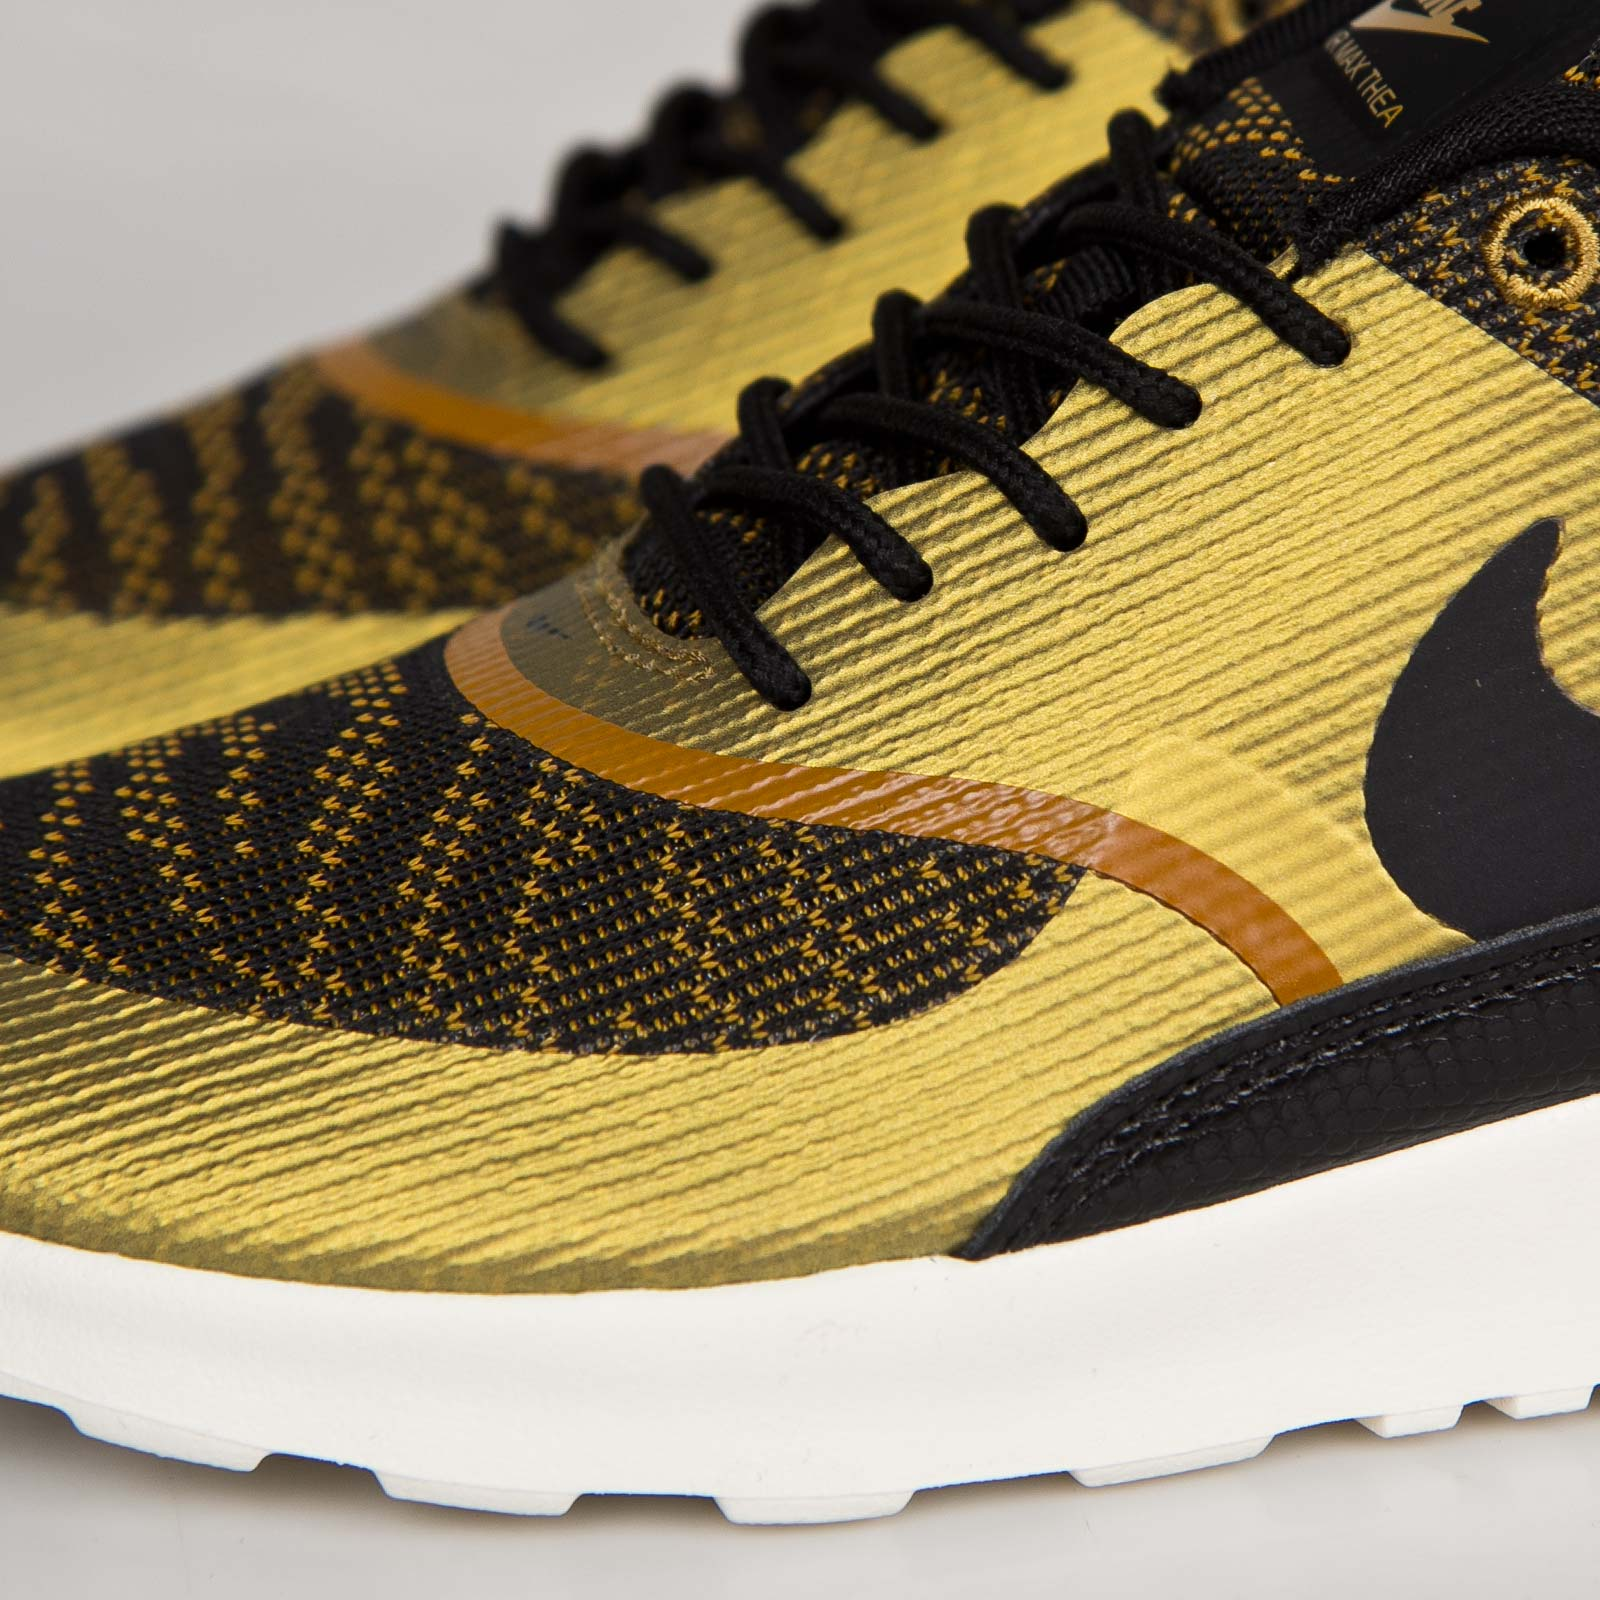 Nike W Air Max Thea Knit Jacquard 718646 700